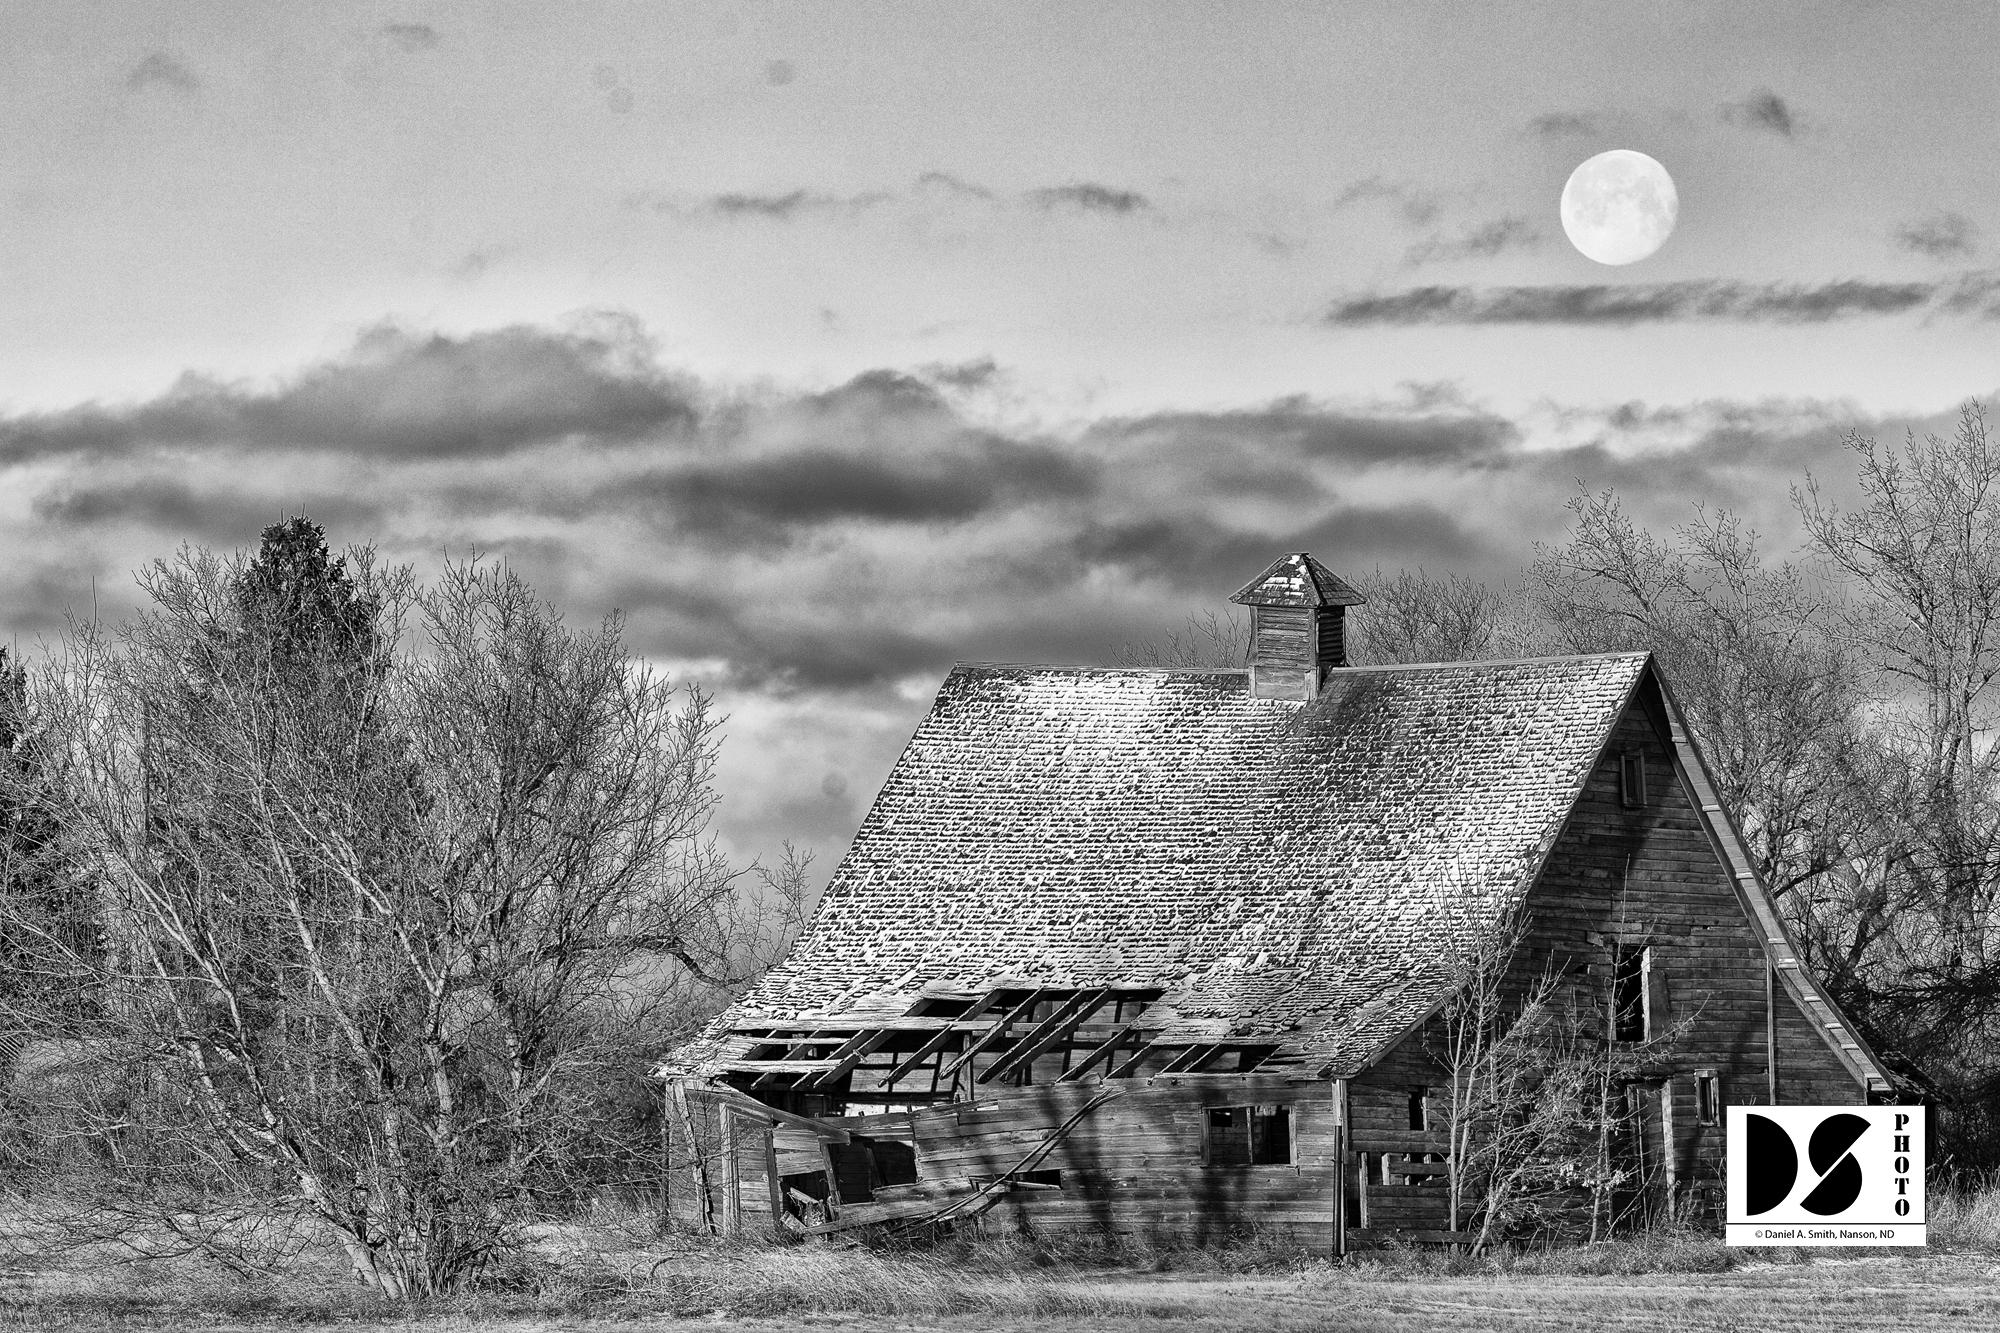 Moonset, North Dakota ©2020 Daniel A. Smith